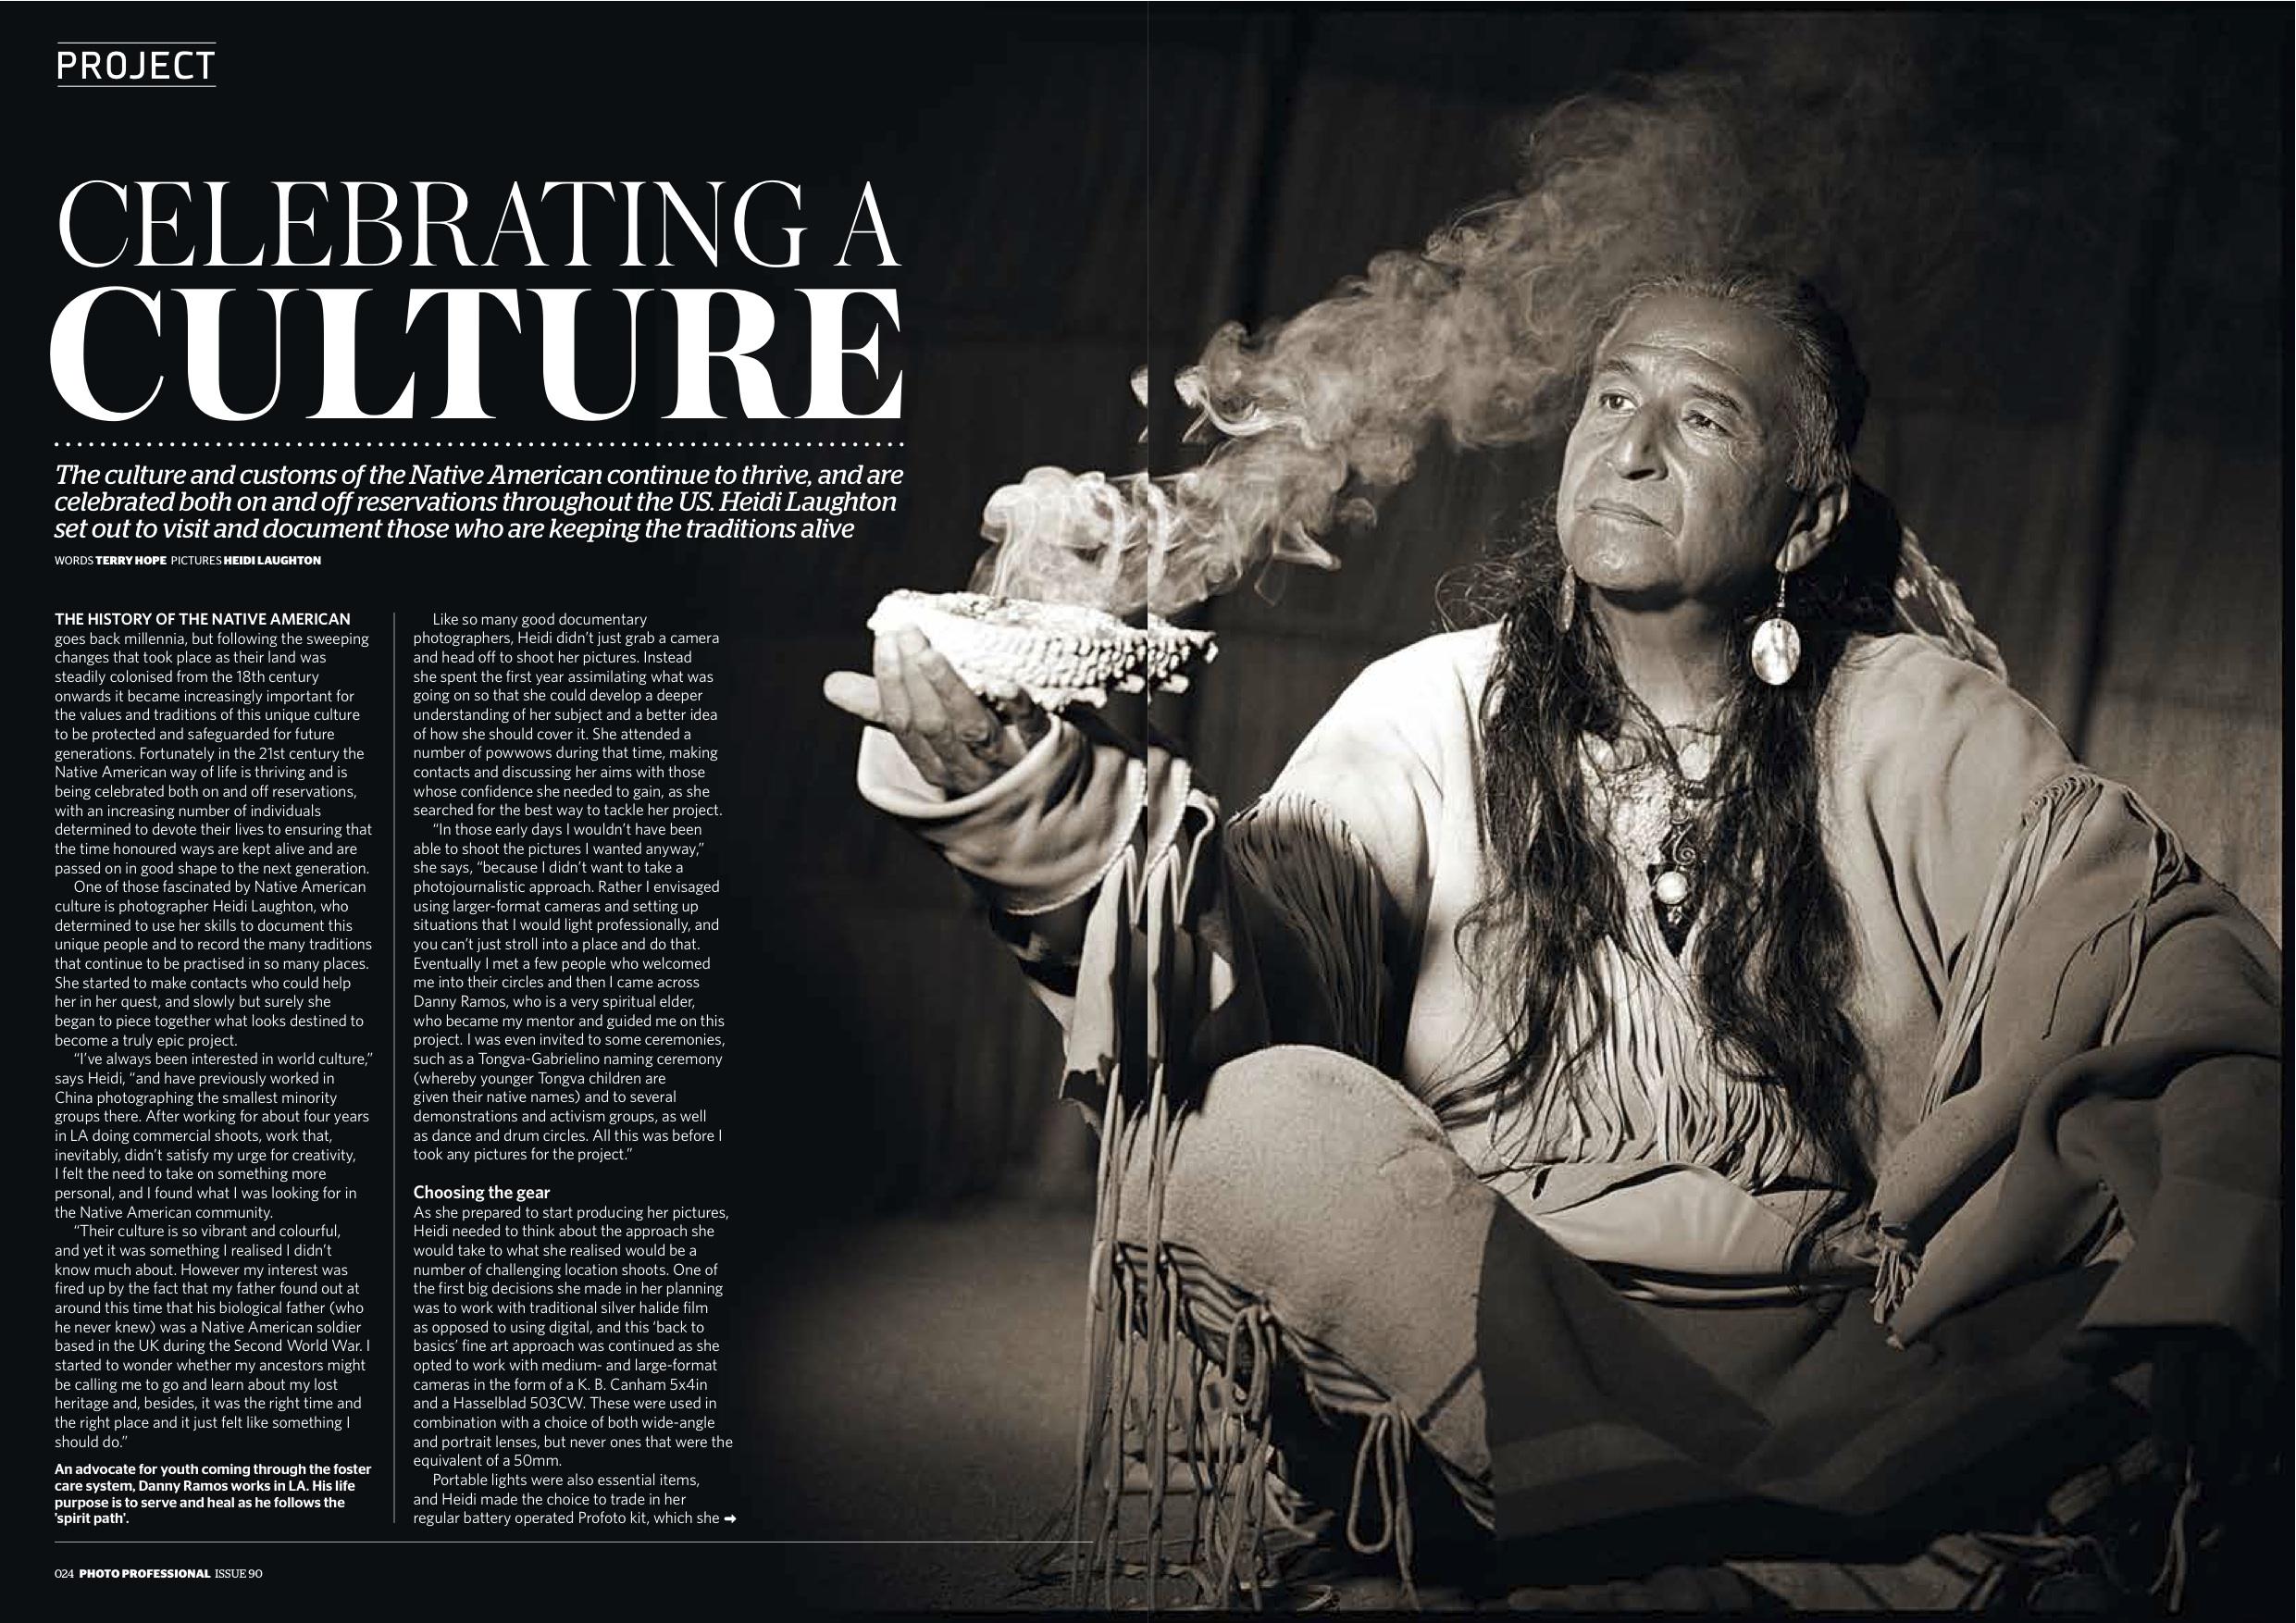 Native American Culture Series for Photo Pro magazine